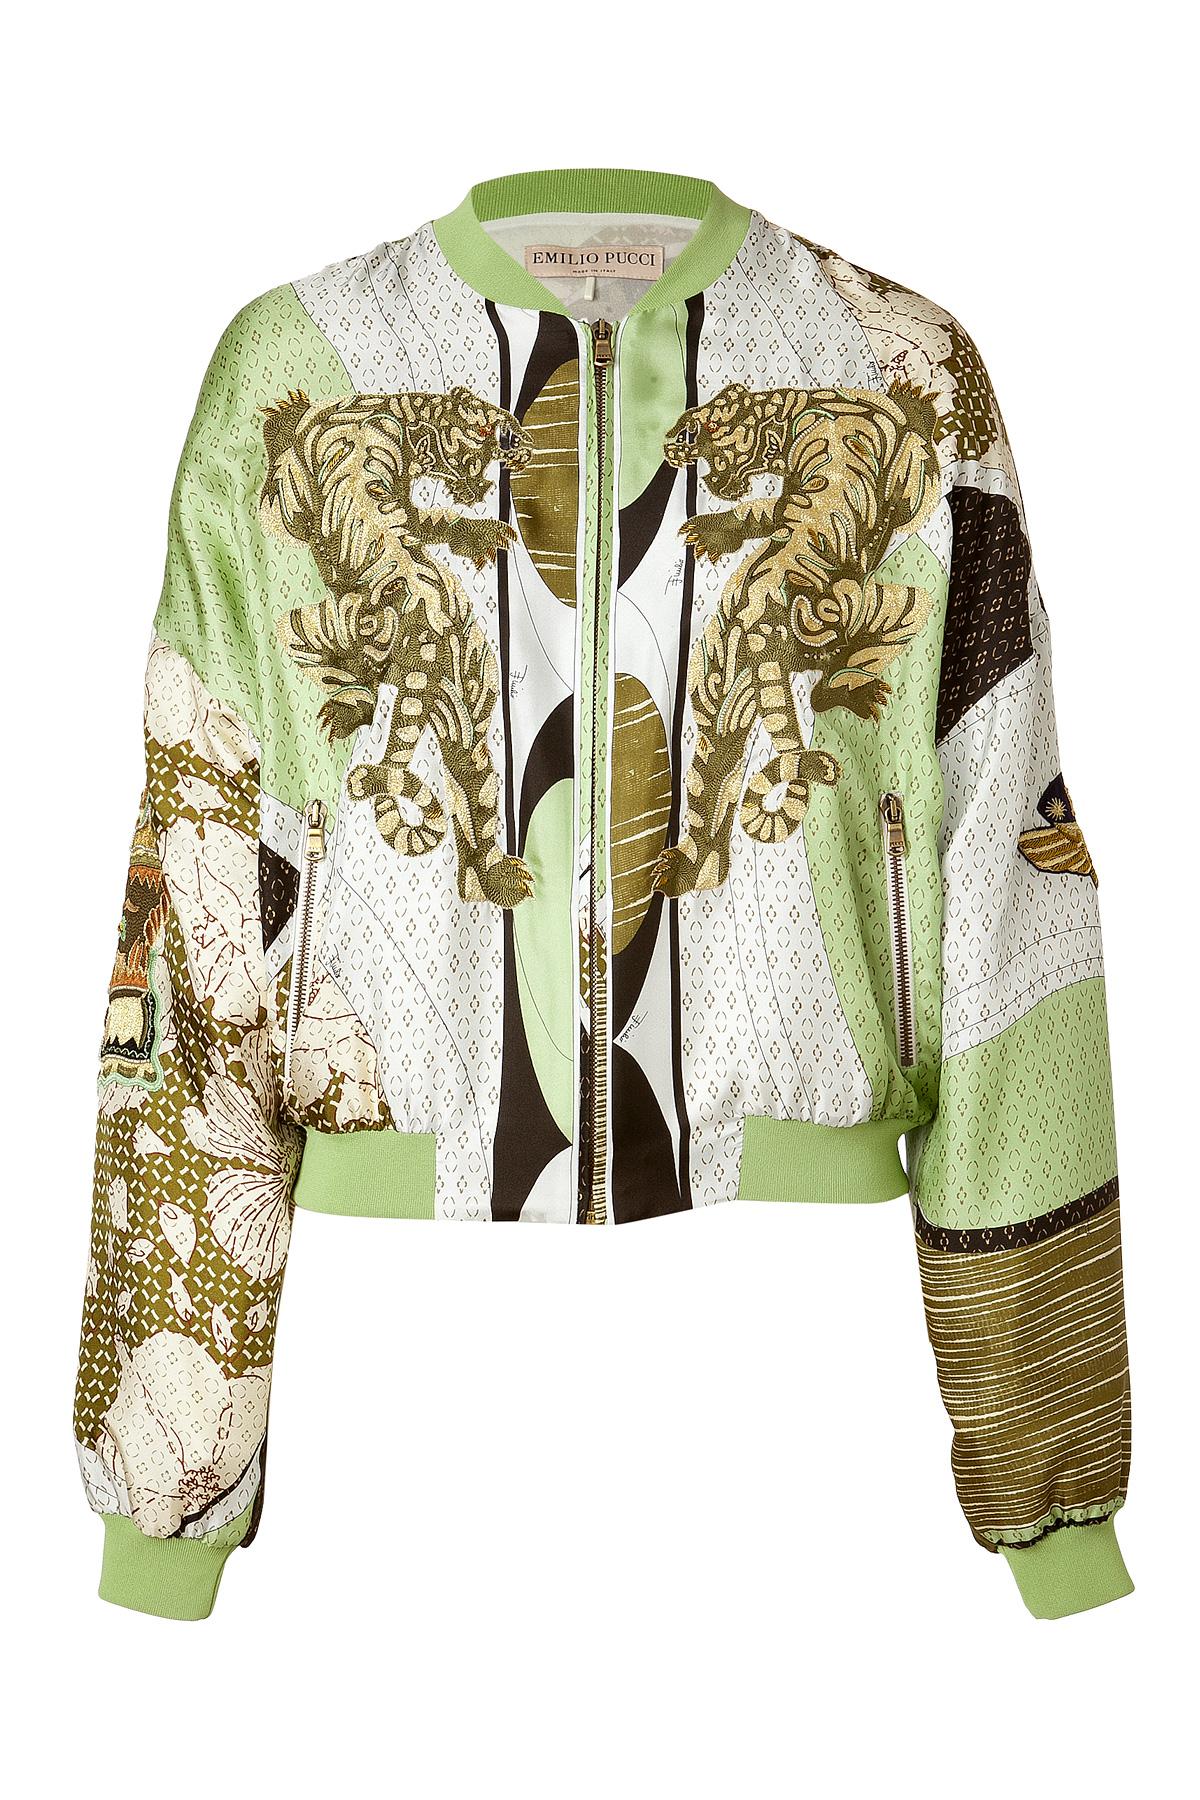 Emilio Pucci Applegoldmulti Embroidered Silk Bomber Jacket